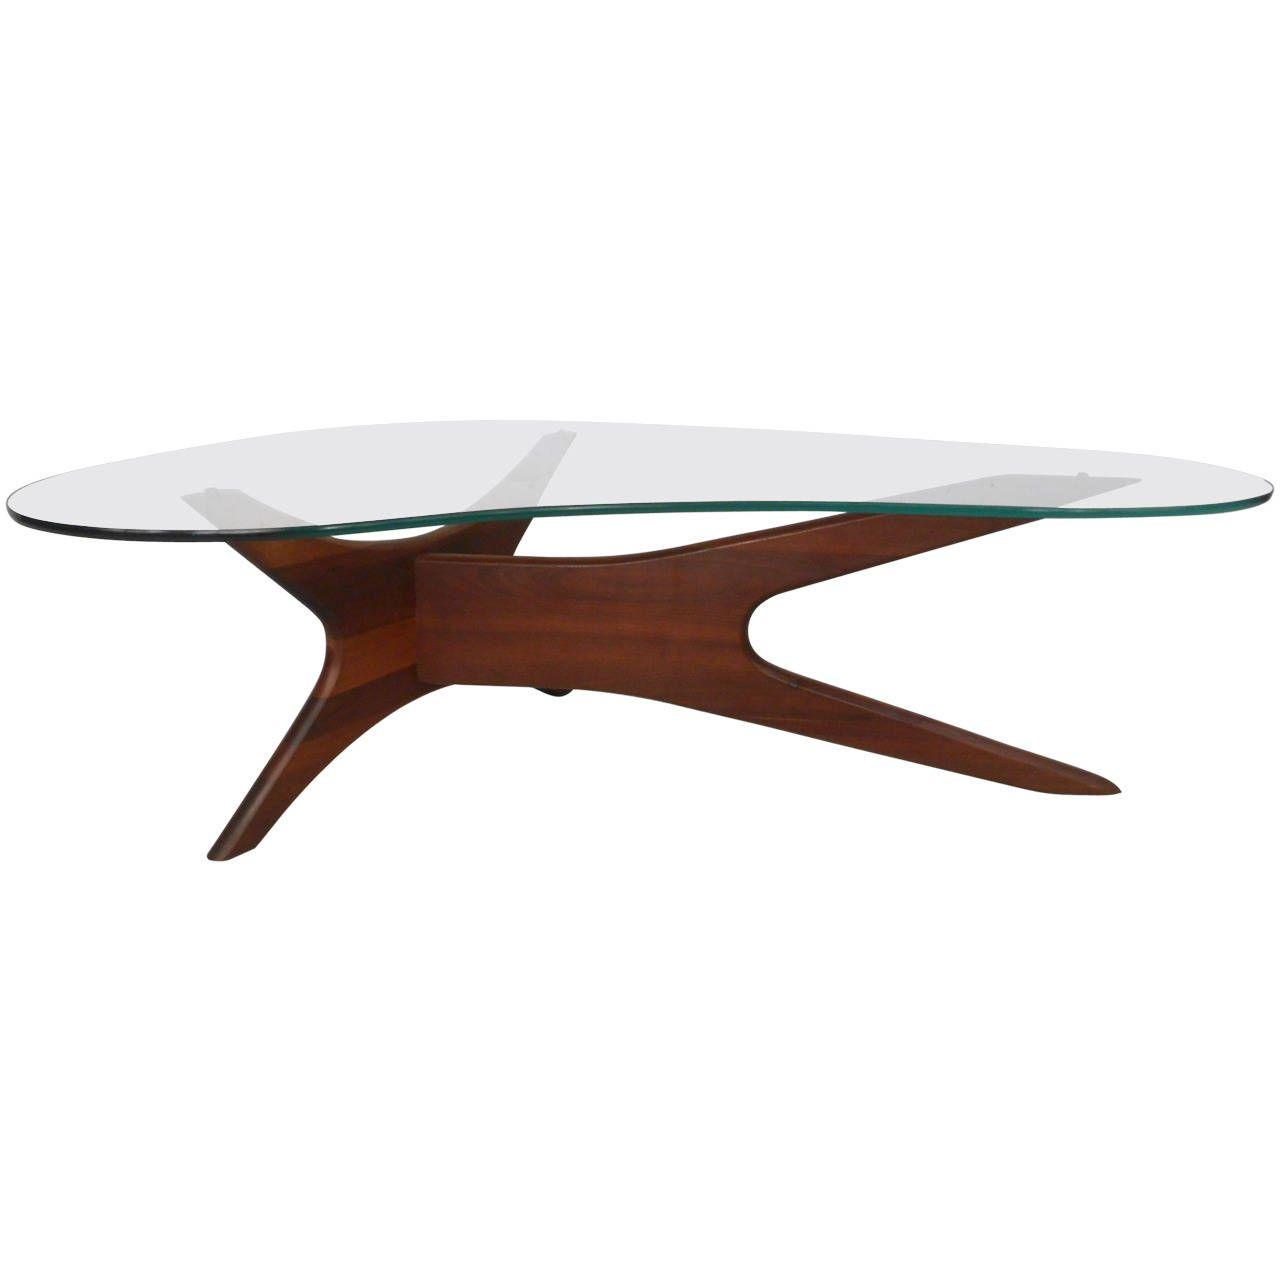 Mid Century Modern Adrian Pearsall Kidney Shaped Jacks Coffee Table 1stdibs Com Coffee Table Table Pearsall [ 1280 x 1280 Pixel ]